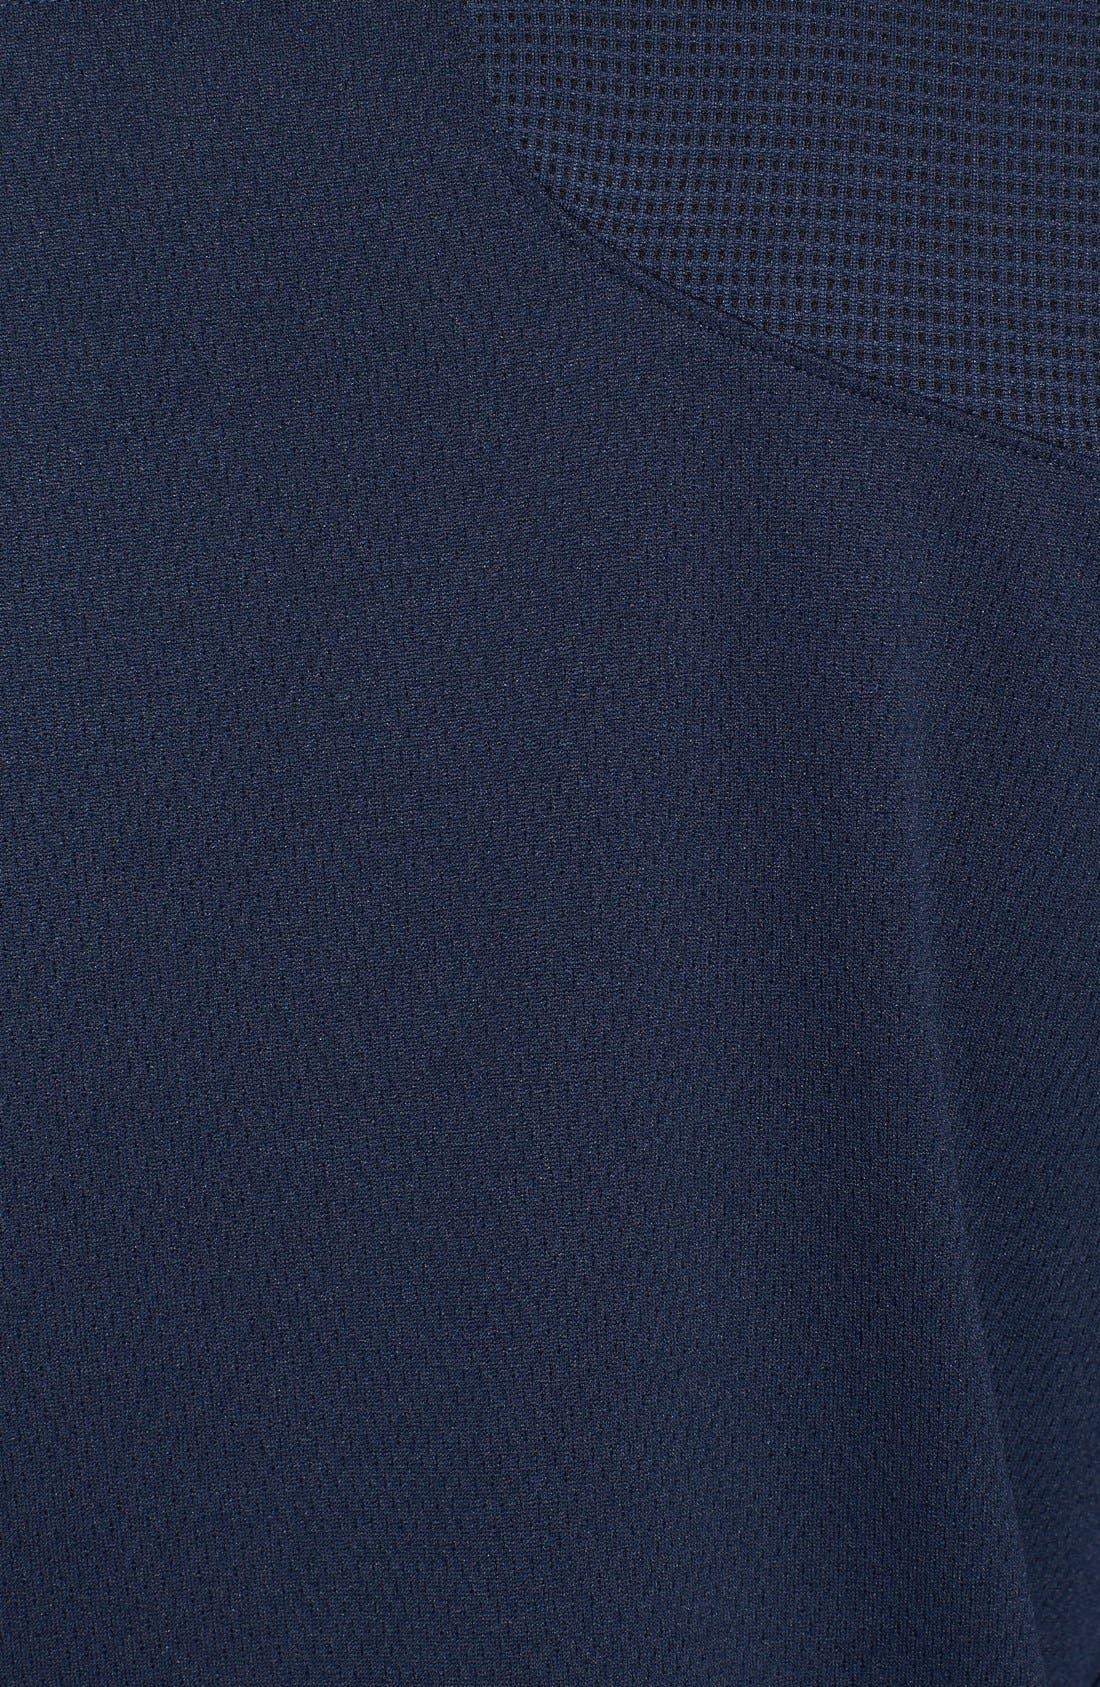 DryTec Half Zip Pullover,                             Alternate thumbnail 3, color,                             NAVY BLUE